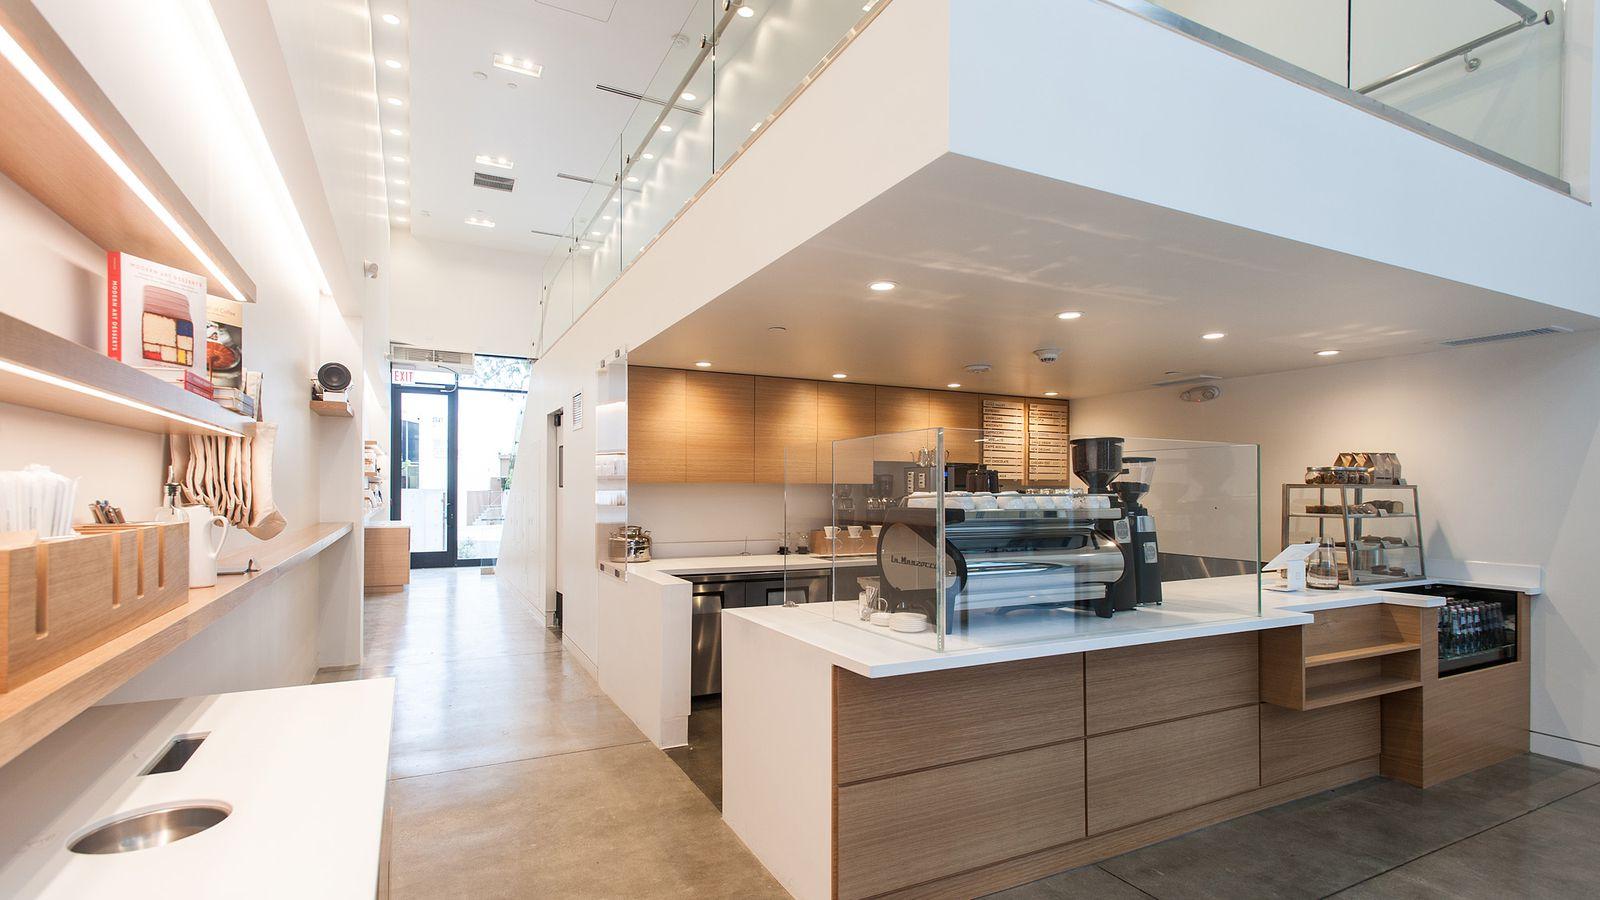 Blue Bottle Coffee S Culver City Shop Is A Minimalist Gem